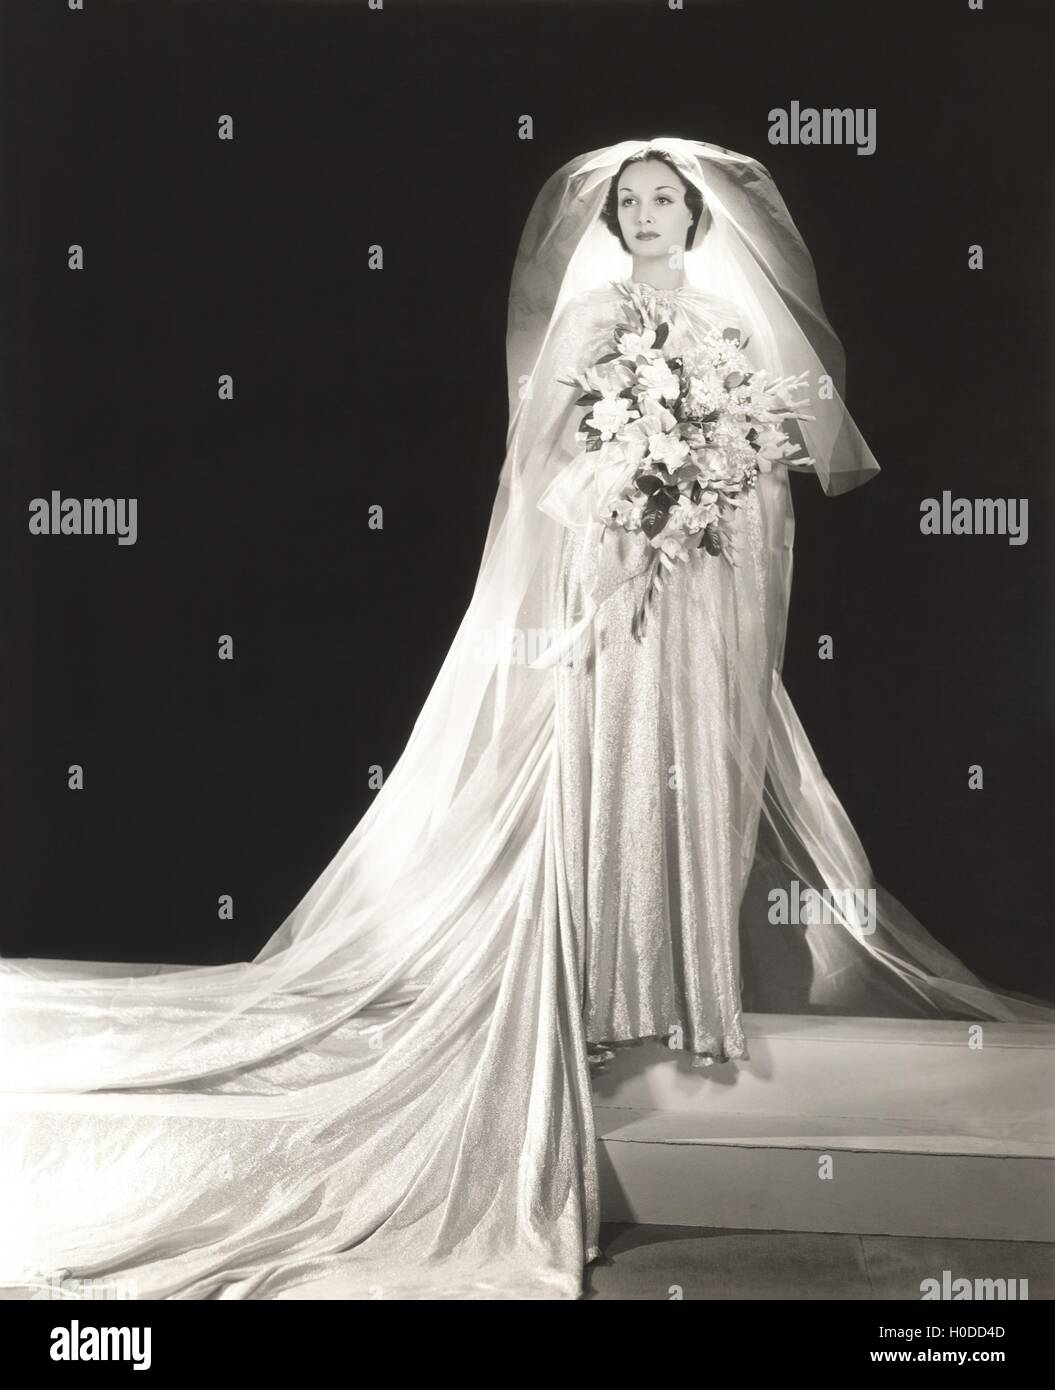 Bride wearing glittery wedding dress - Stock Image